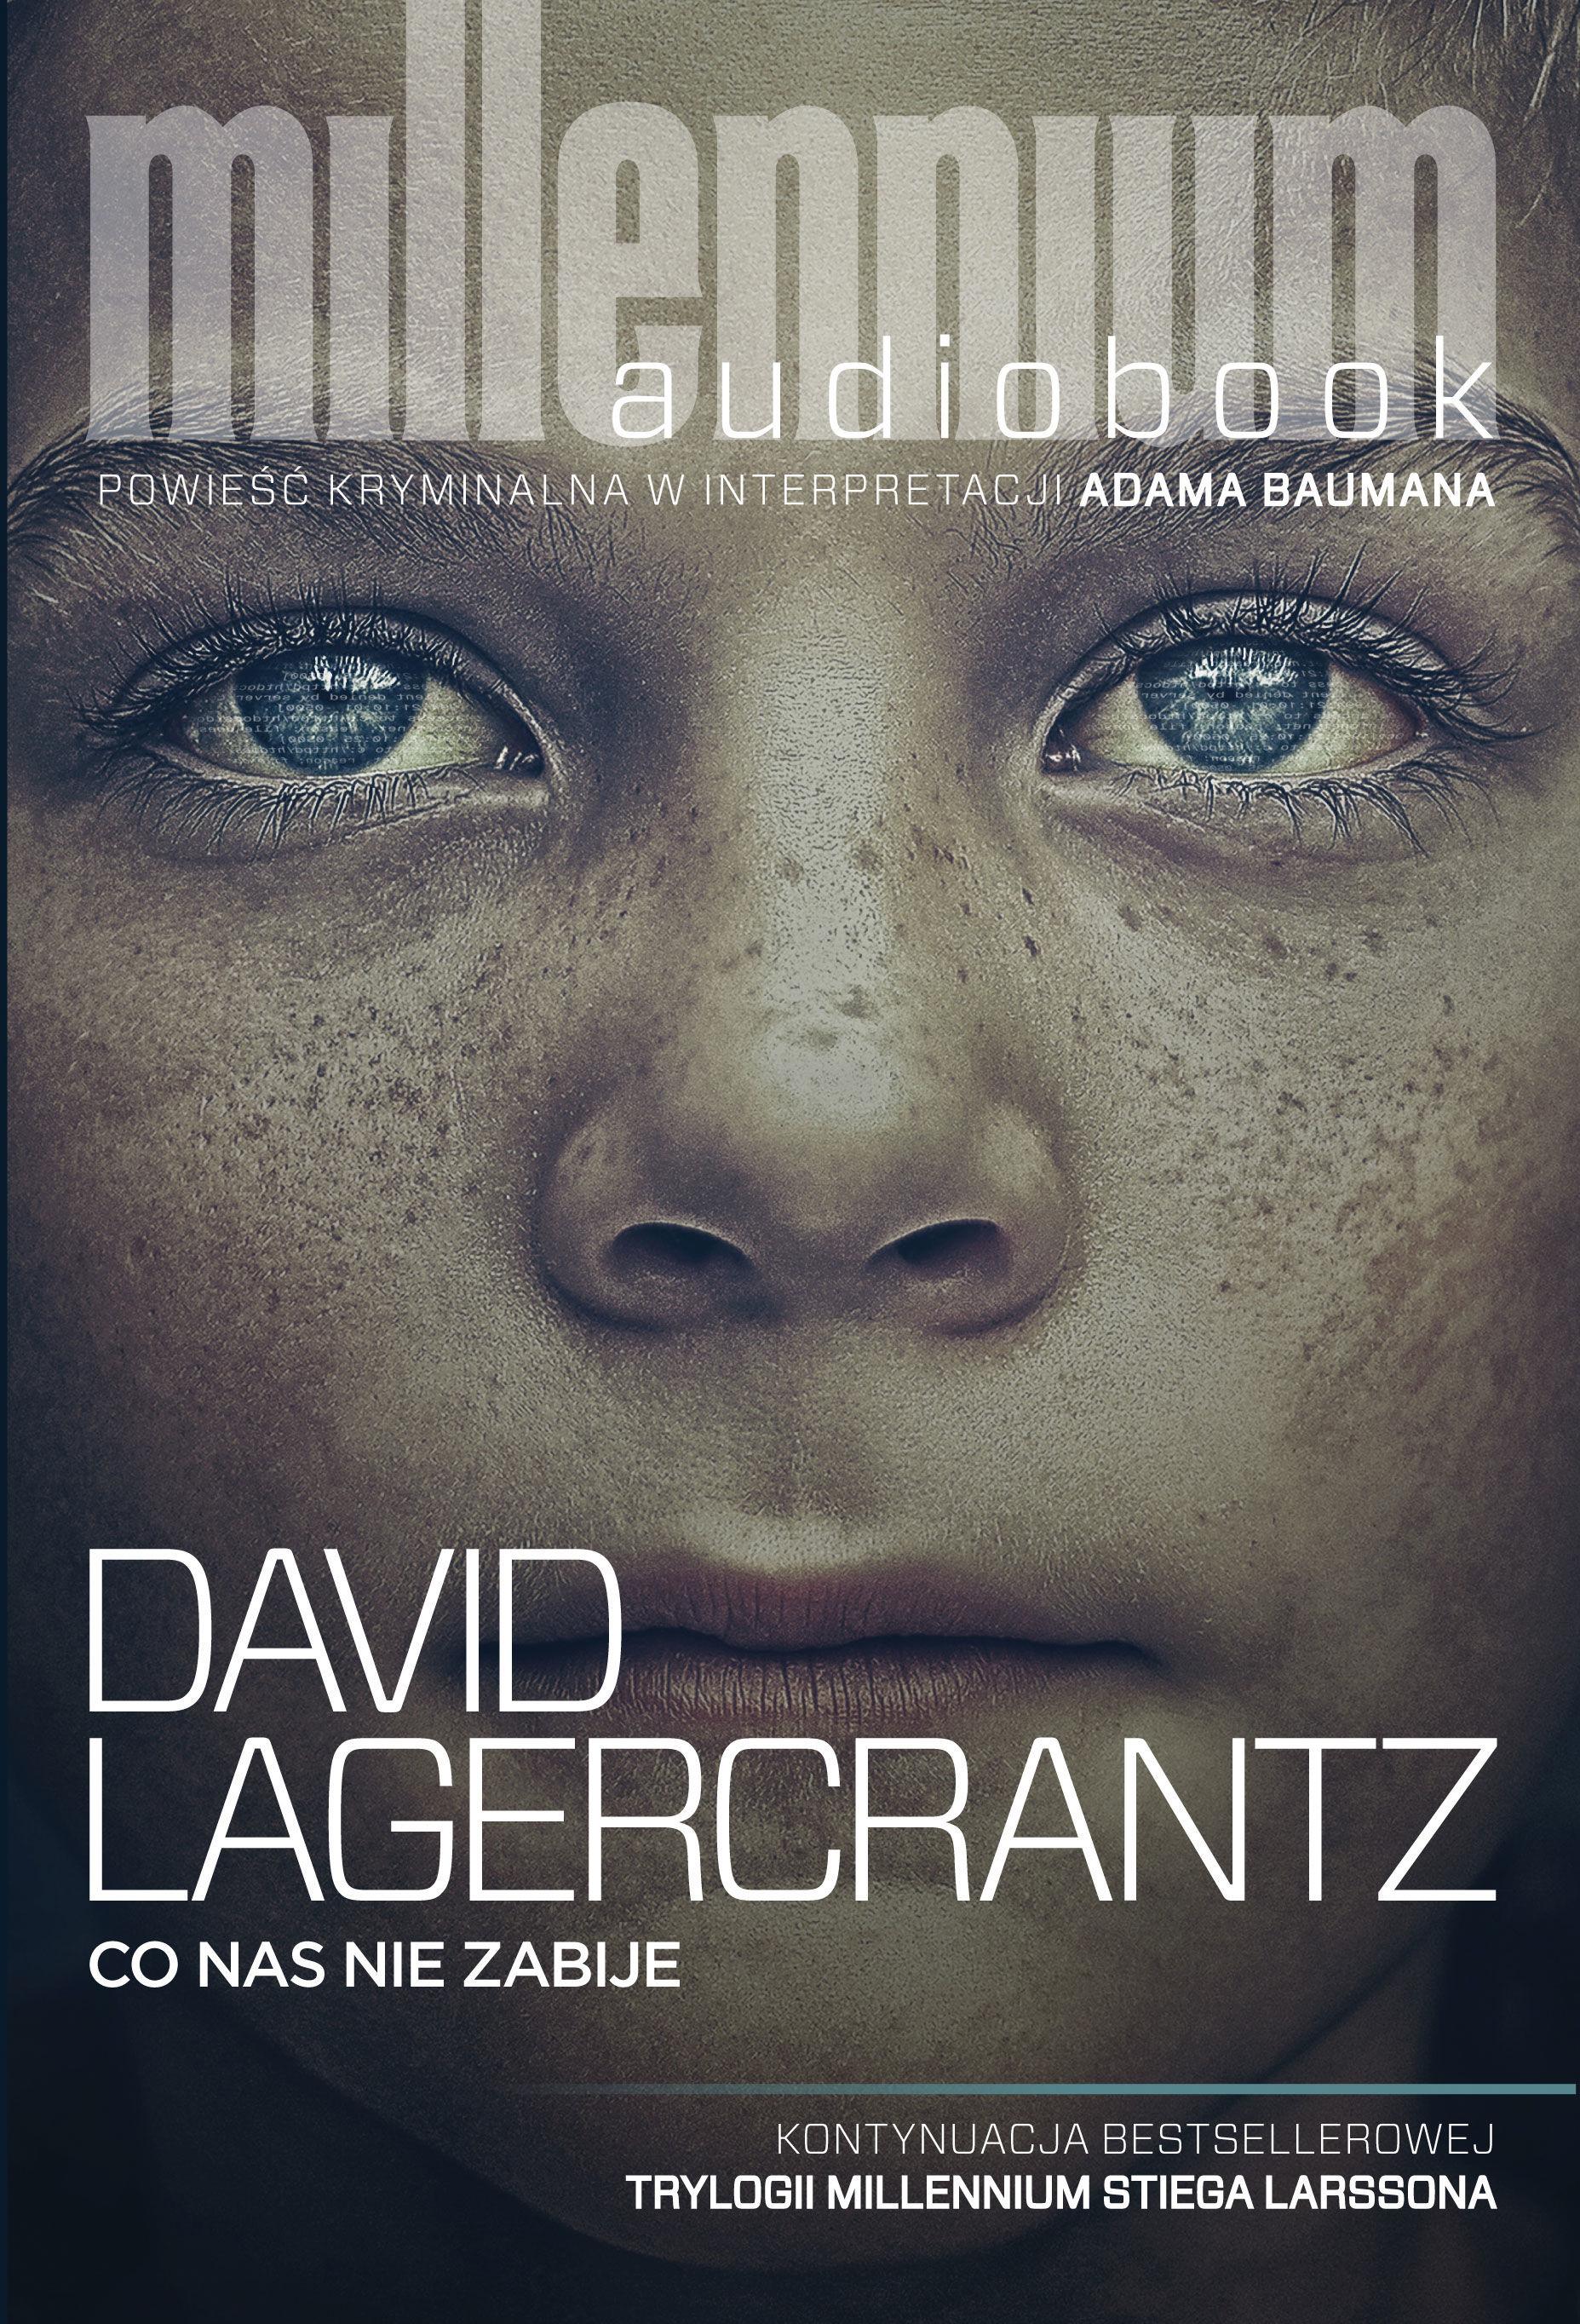 Co nas nie zabije - David Lagercrantz - audiobook